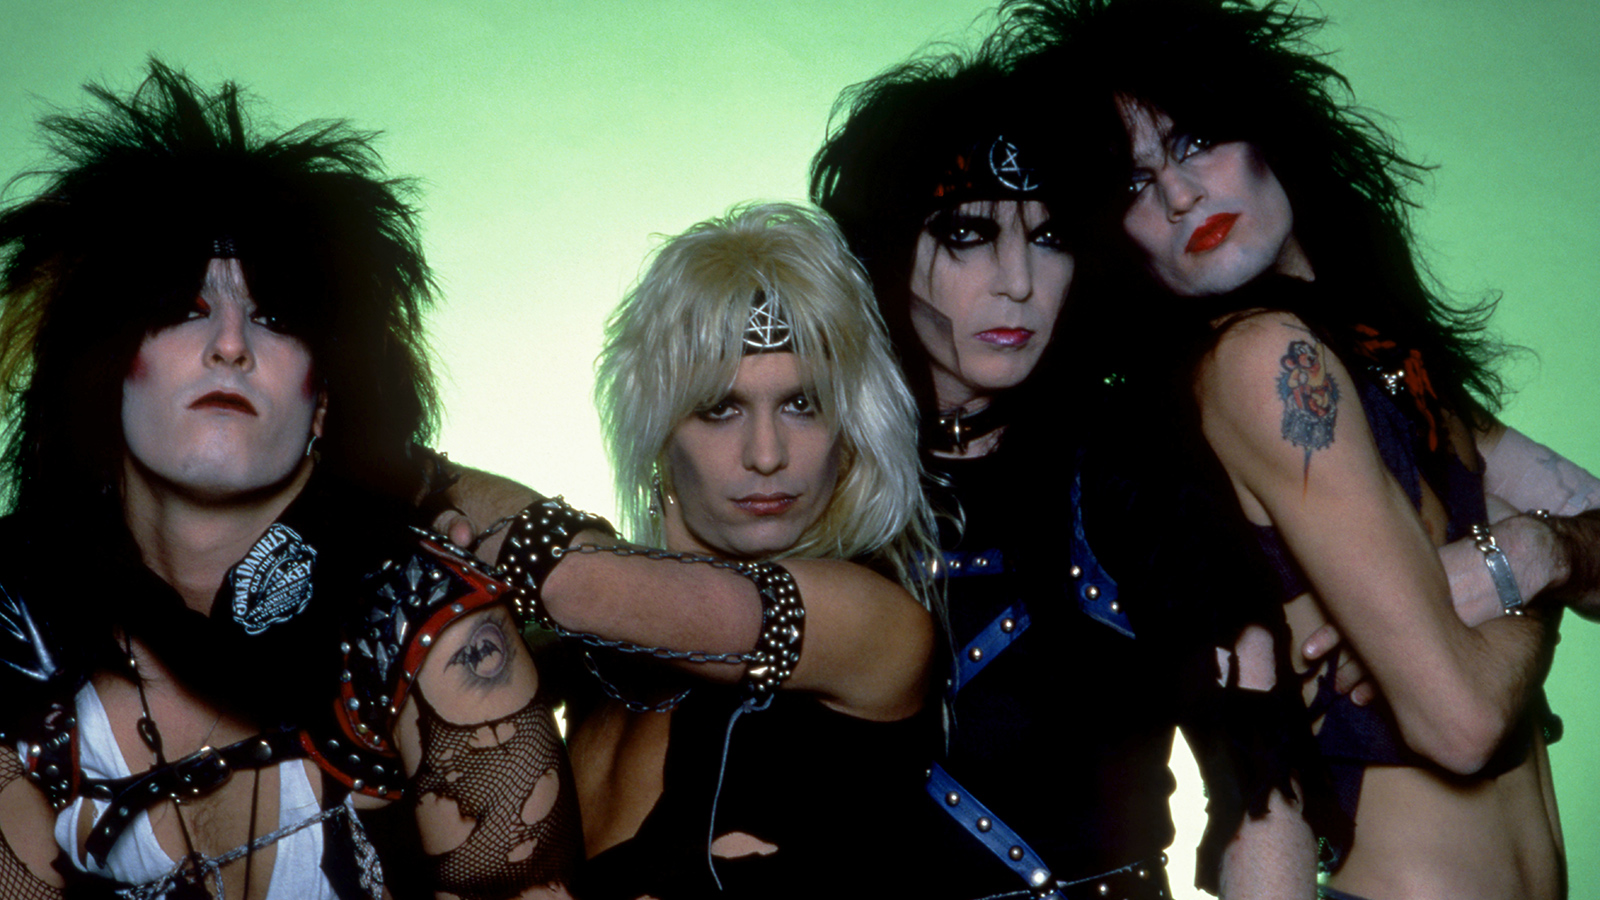 Flipboard: Hear Mötley Crüe's New Song